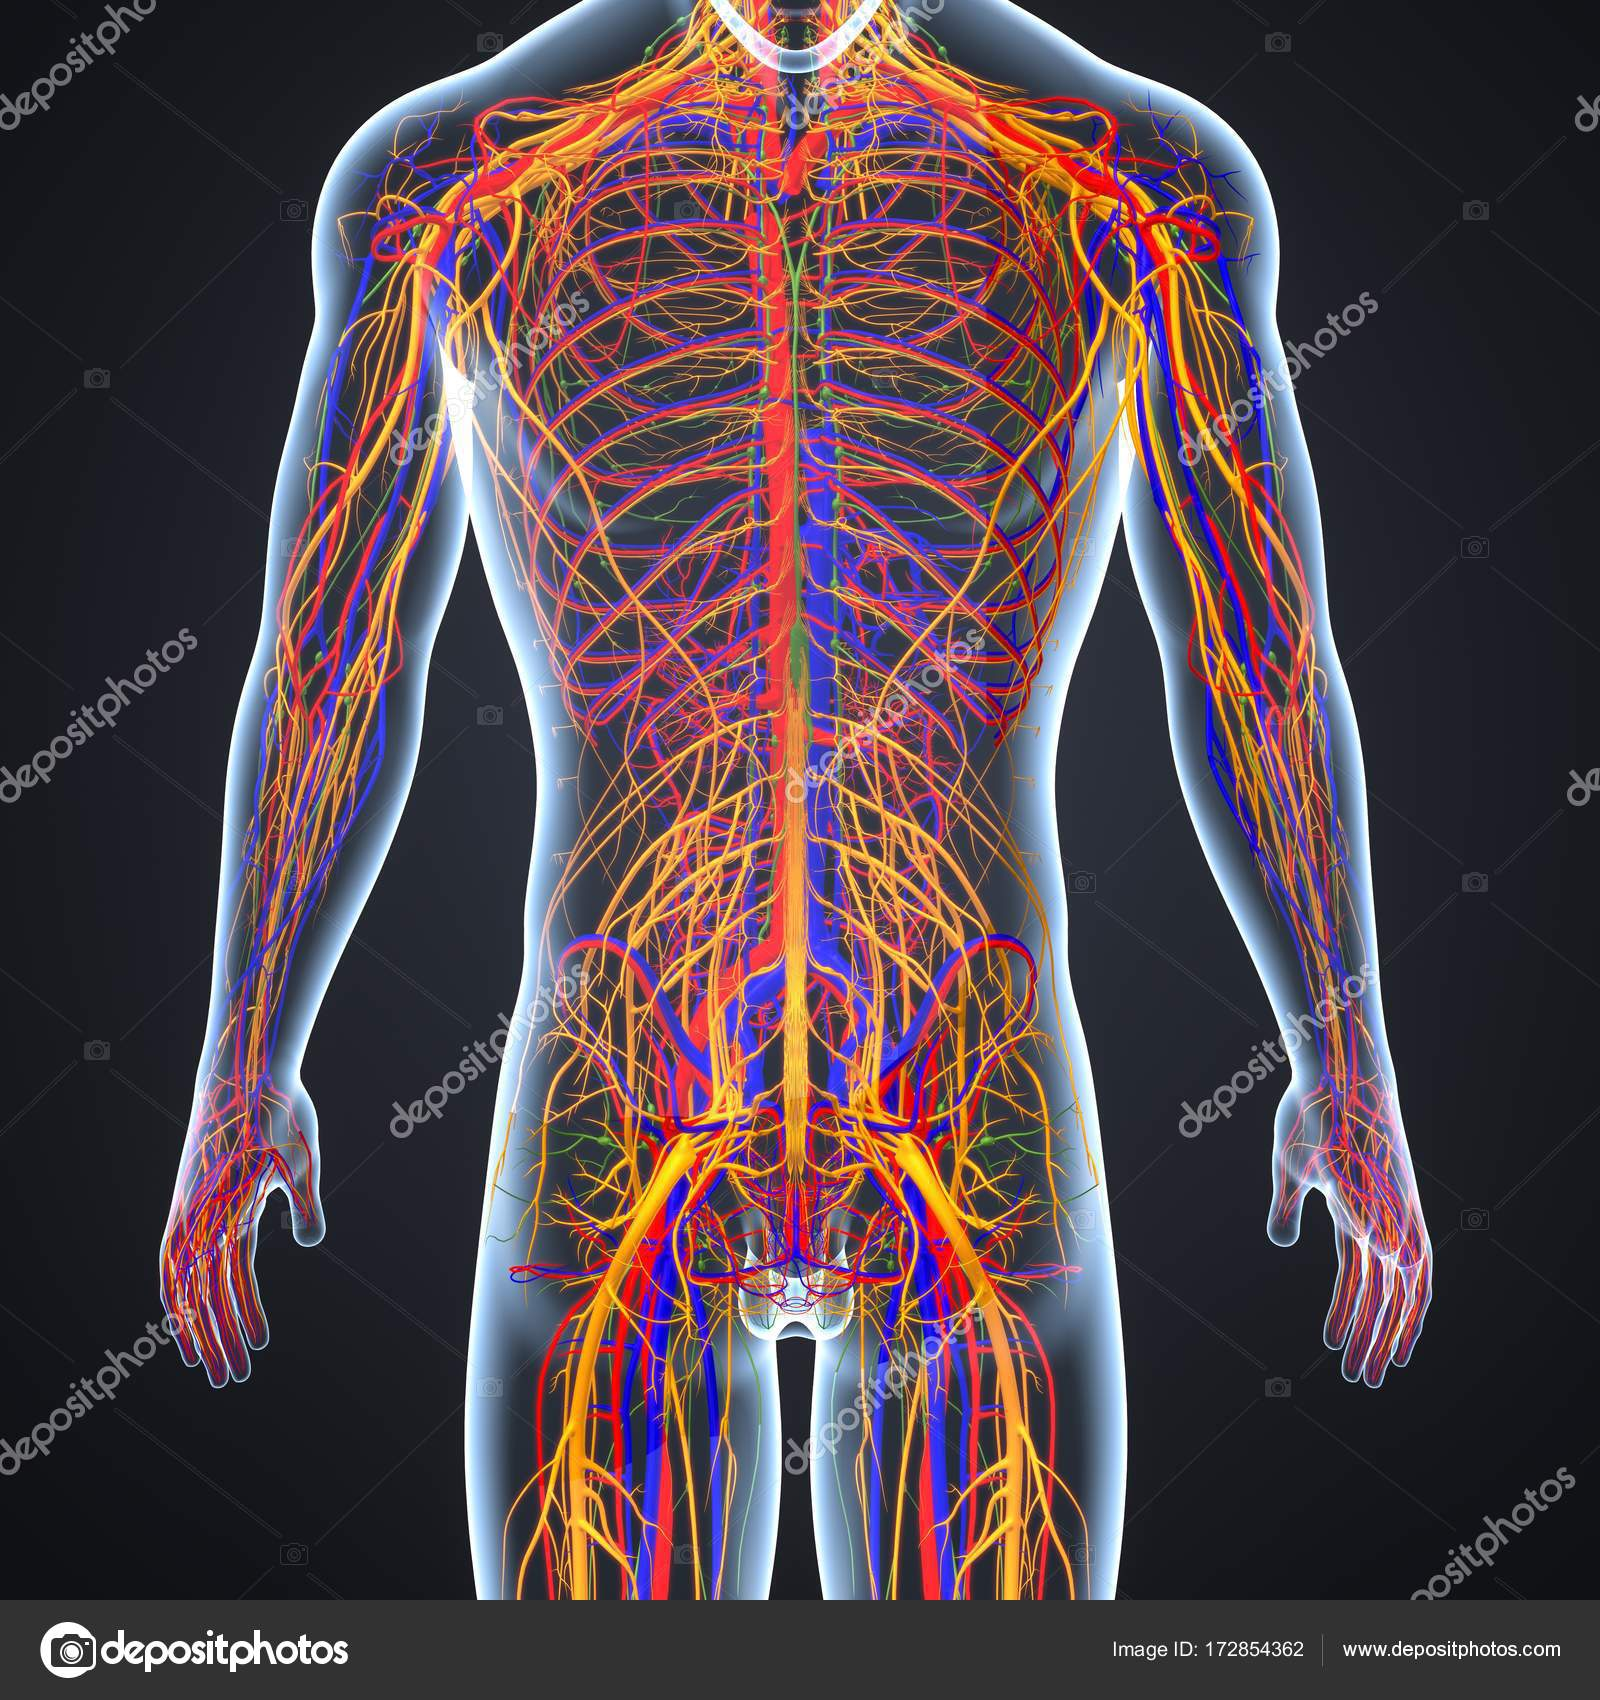 Nervensystem mit Lymphknoten — Stockfoto © sciencepics #172854362